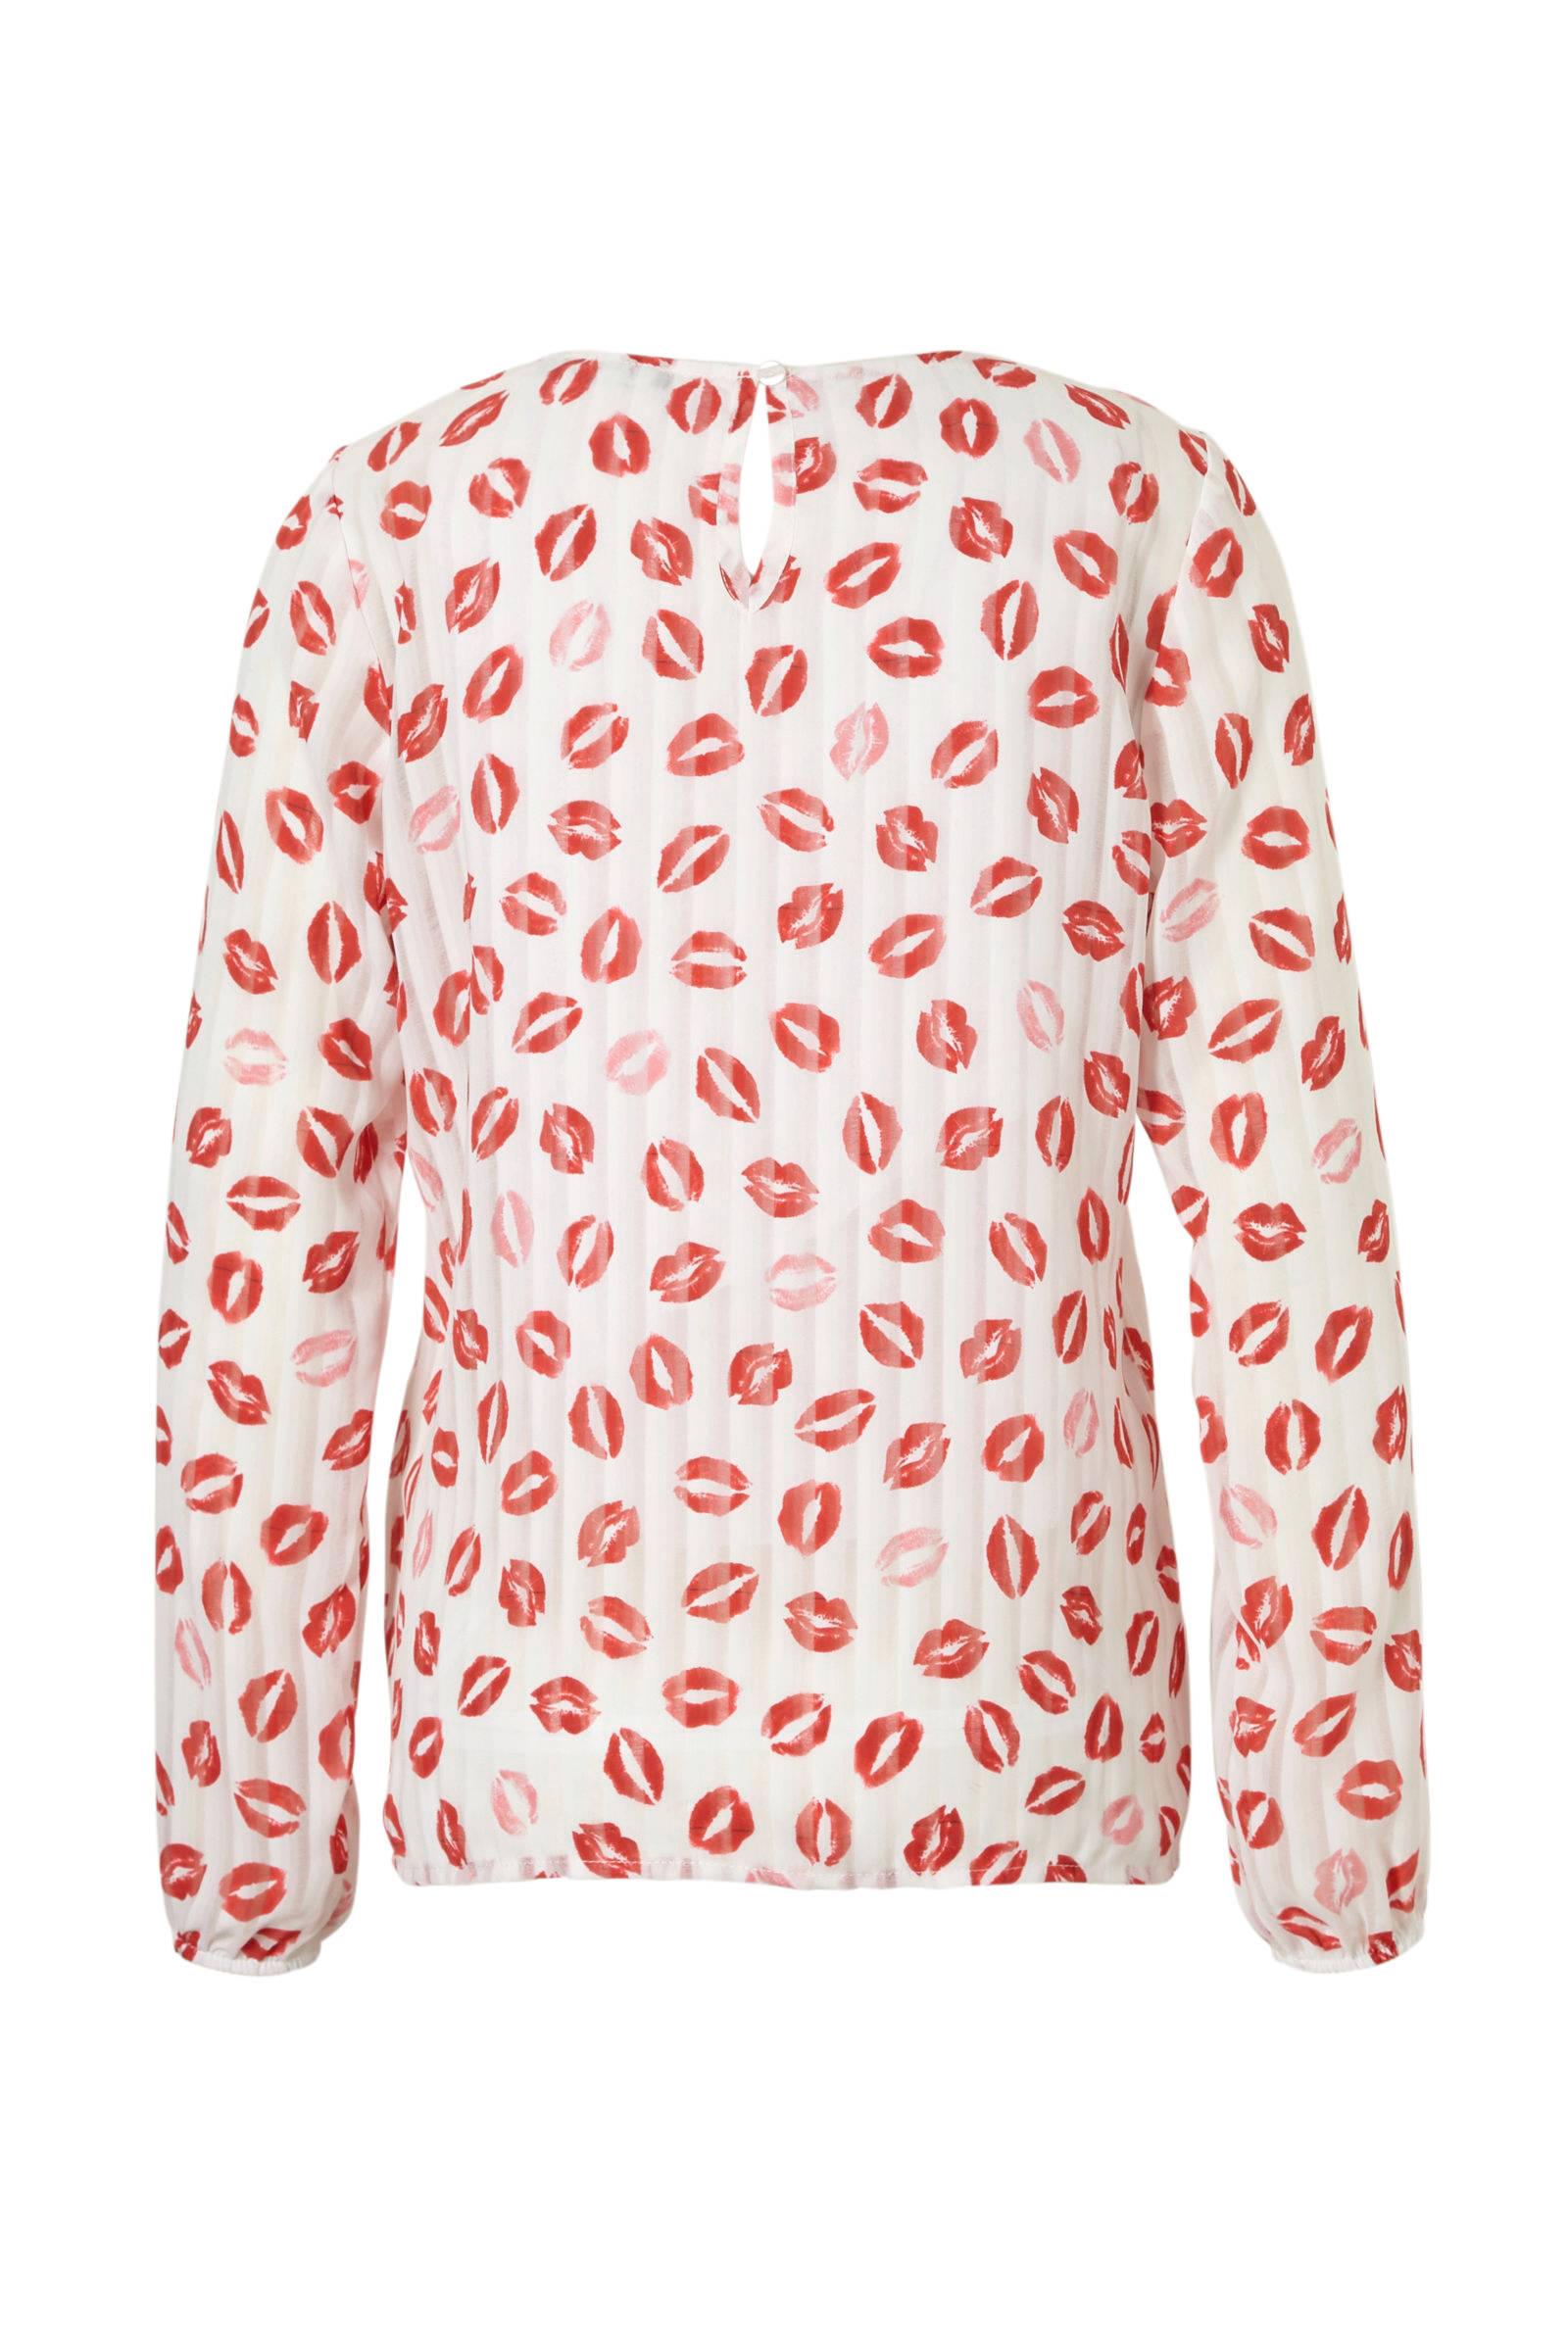 blouse Geisha Geisha met kusjes Geisha kusjes blouse blouse met OYYABFq